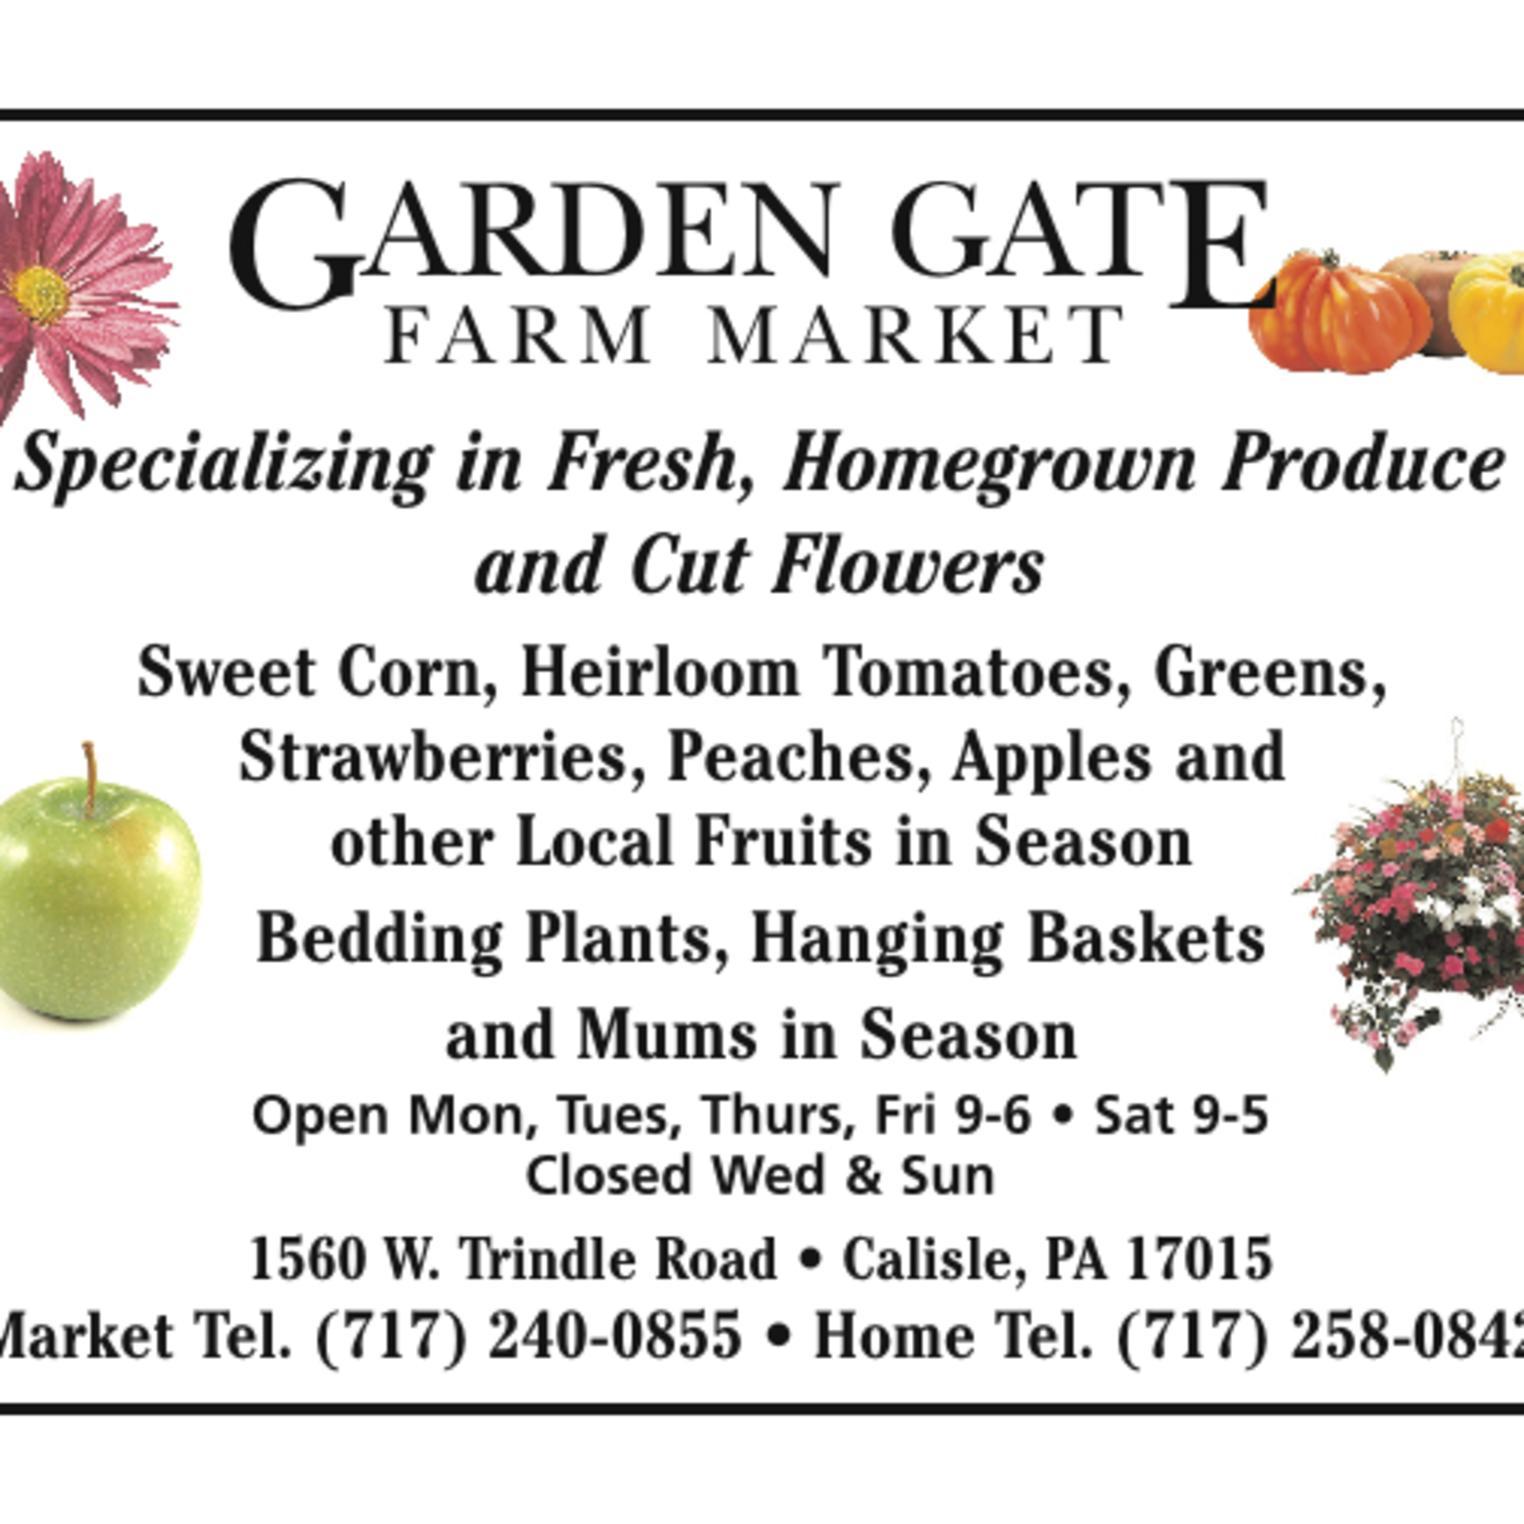 Garden Gate Farm Market